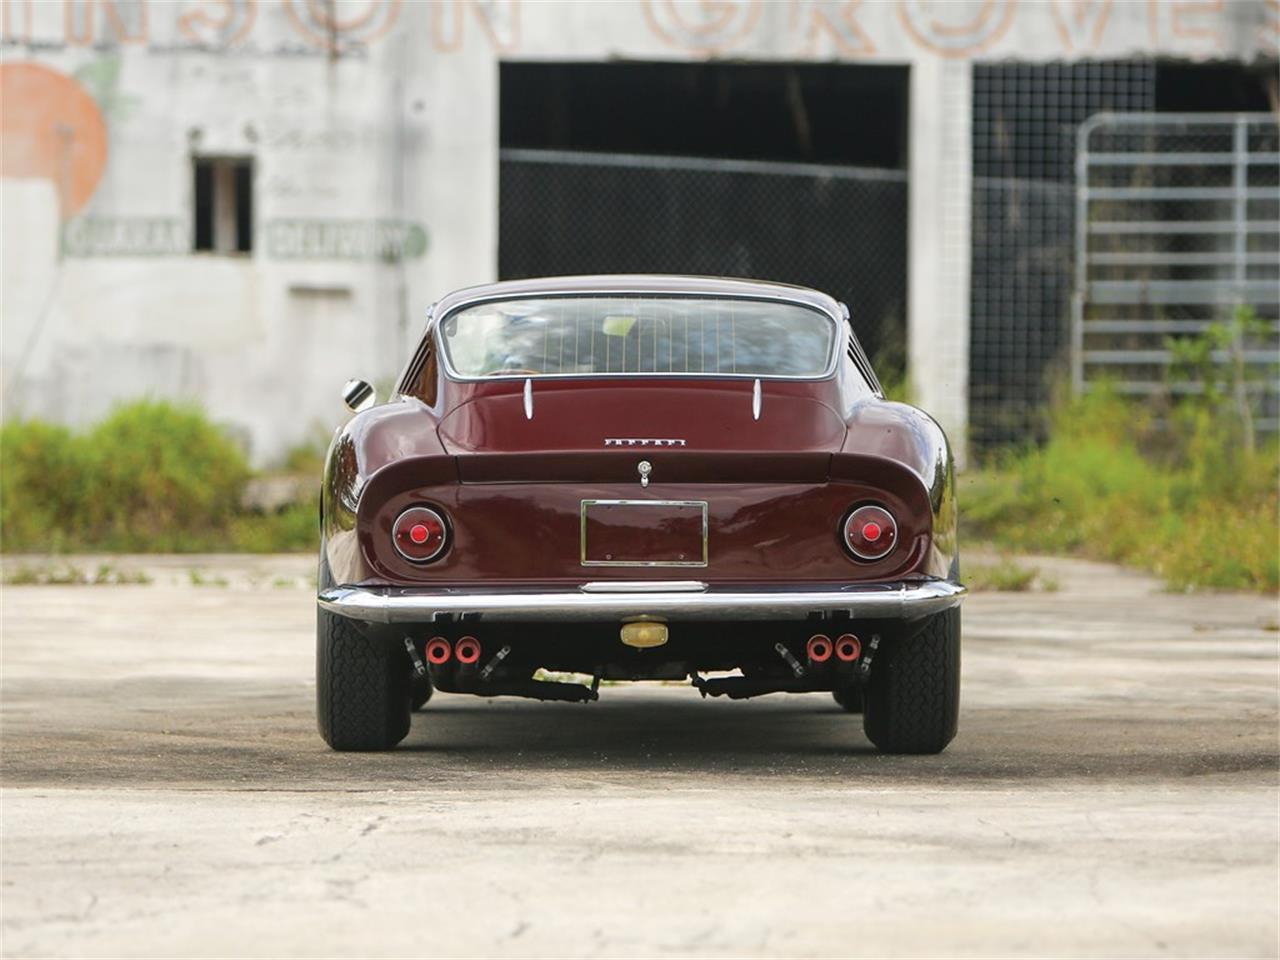 Large Picture of Classic '66 Ferrari 275 GTB located in Monterey California Auction Vehicle - Q20Z